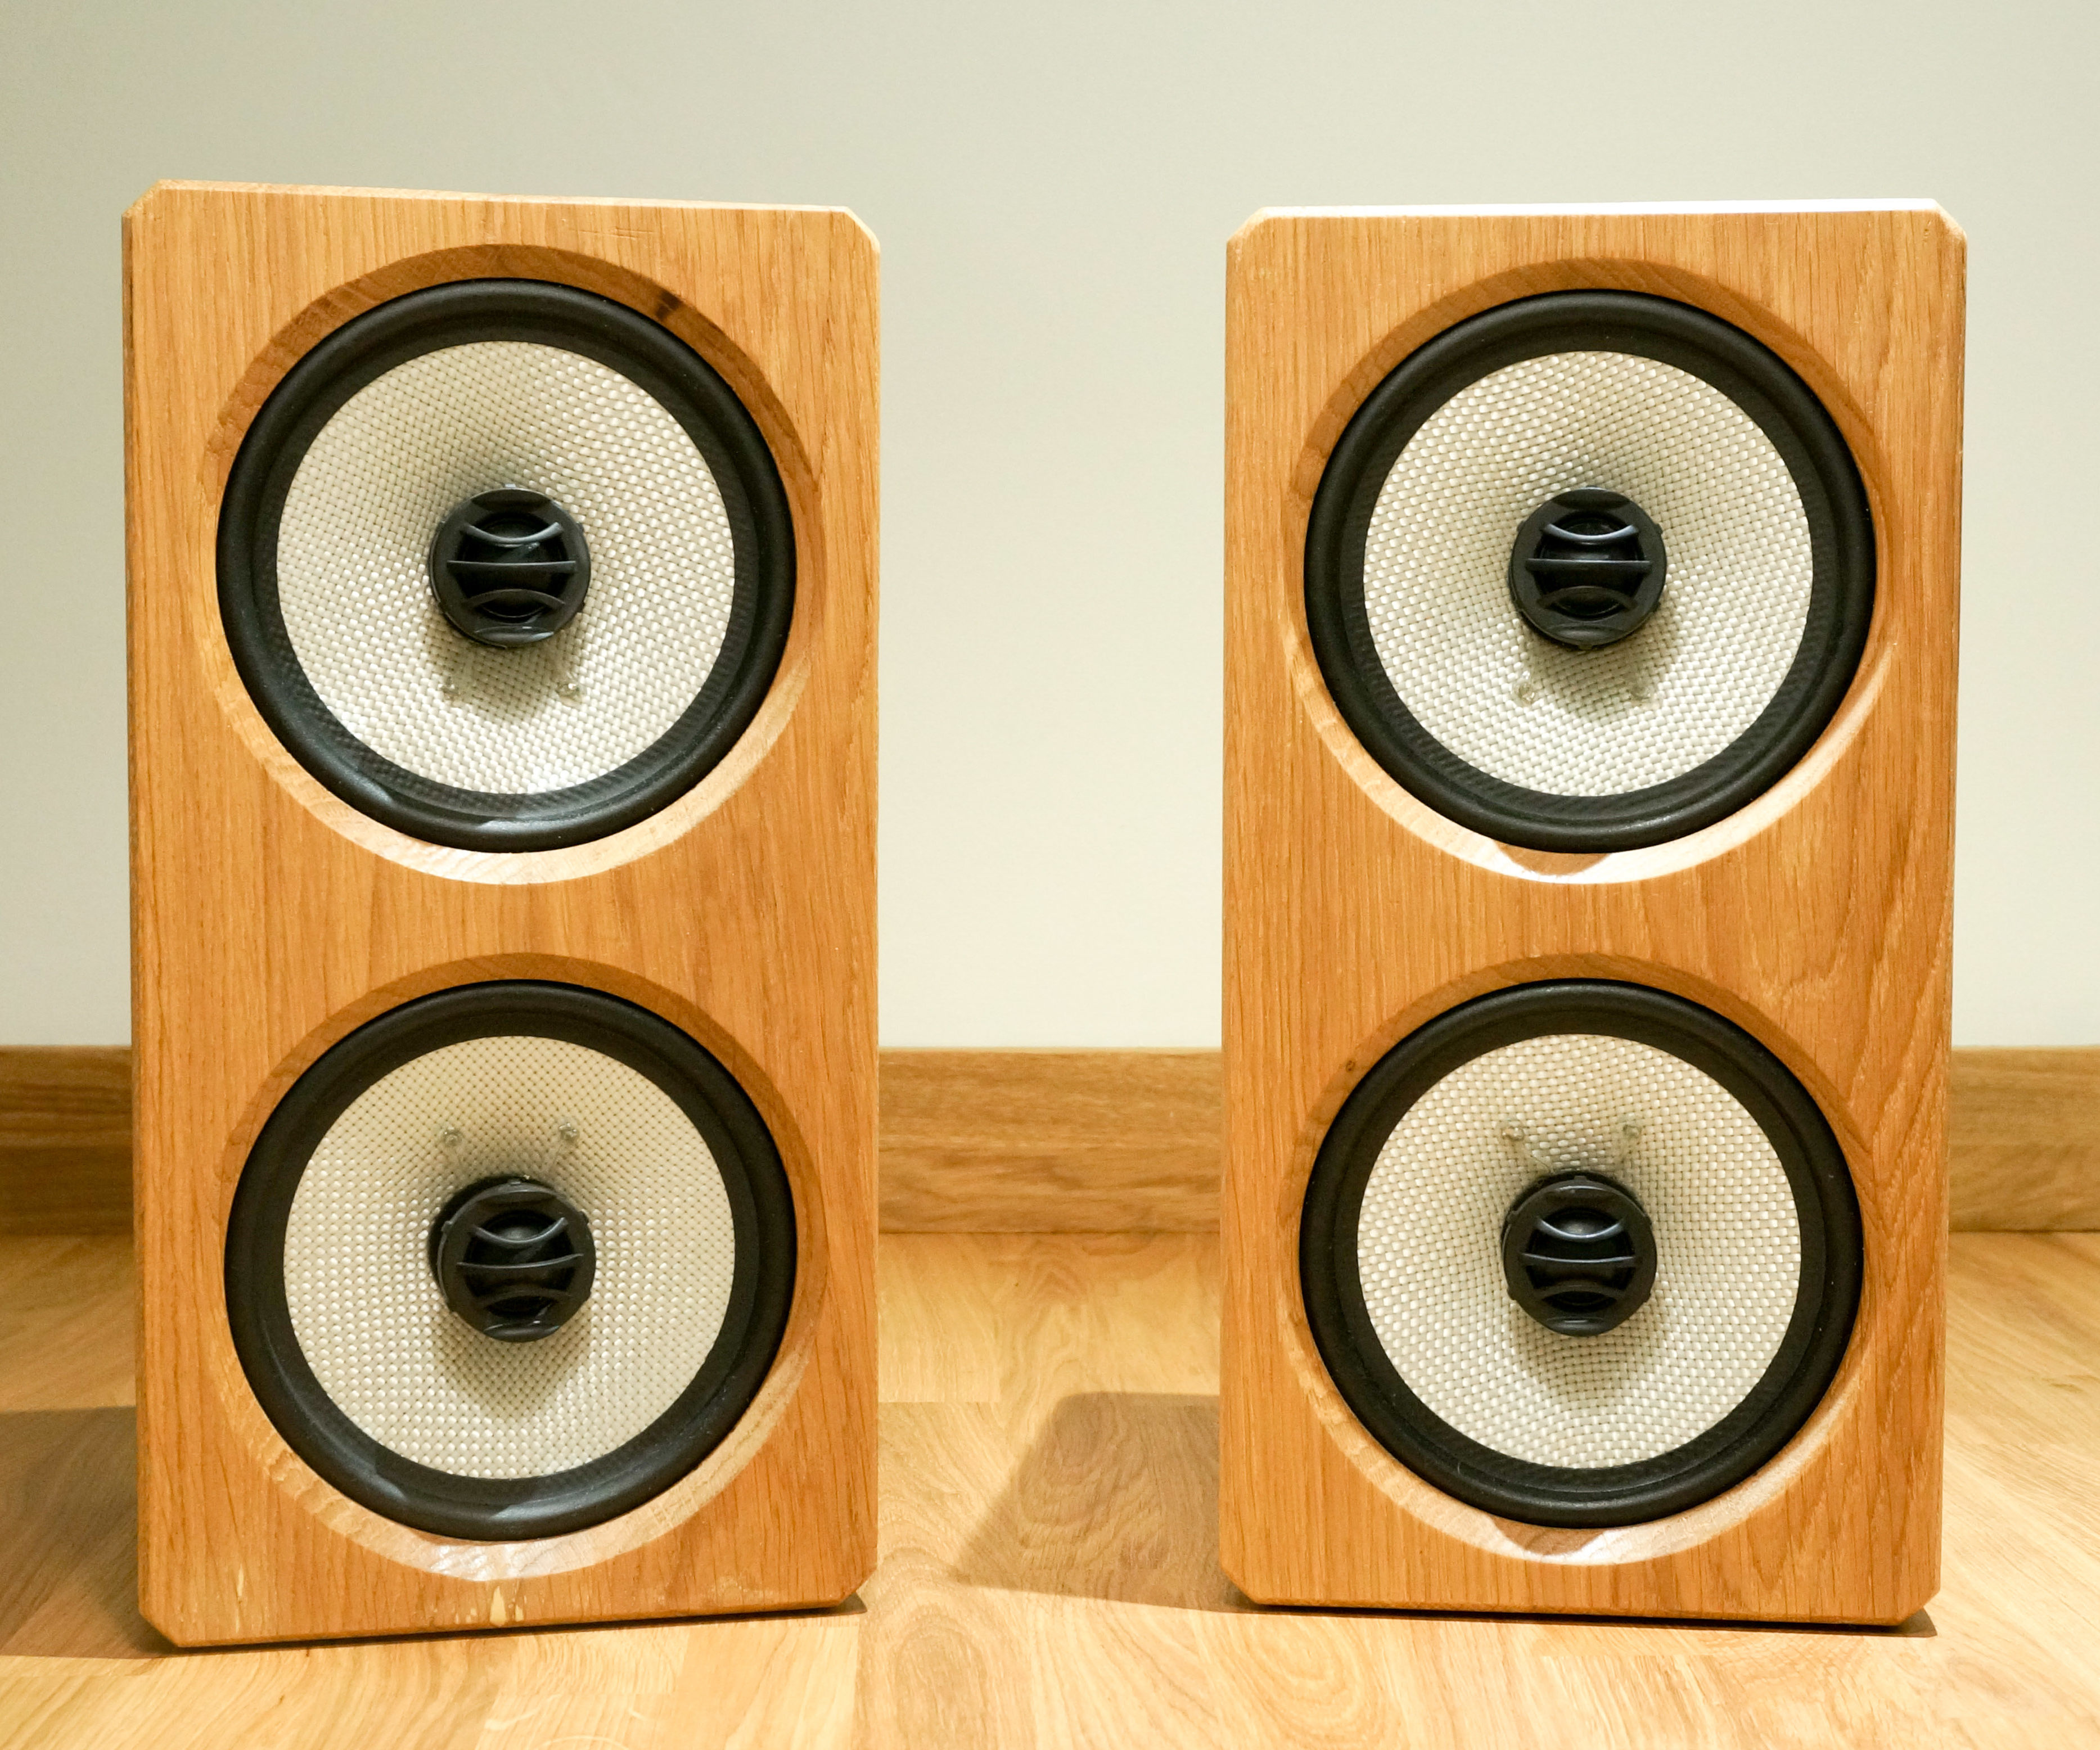 White Oak Faced Powerful Passive Speakers